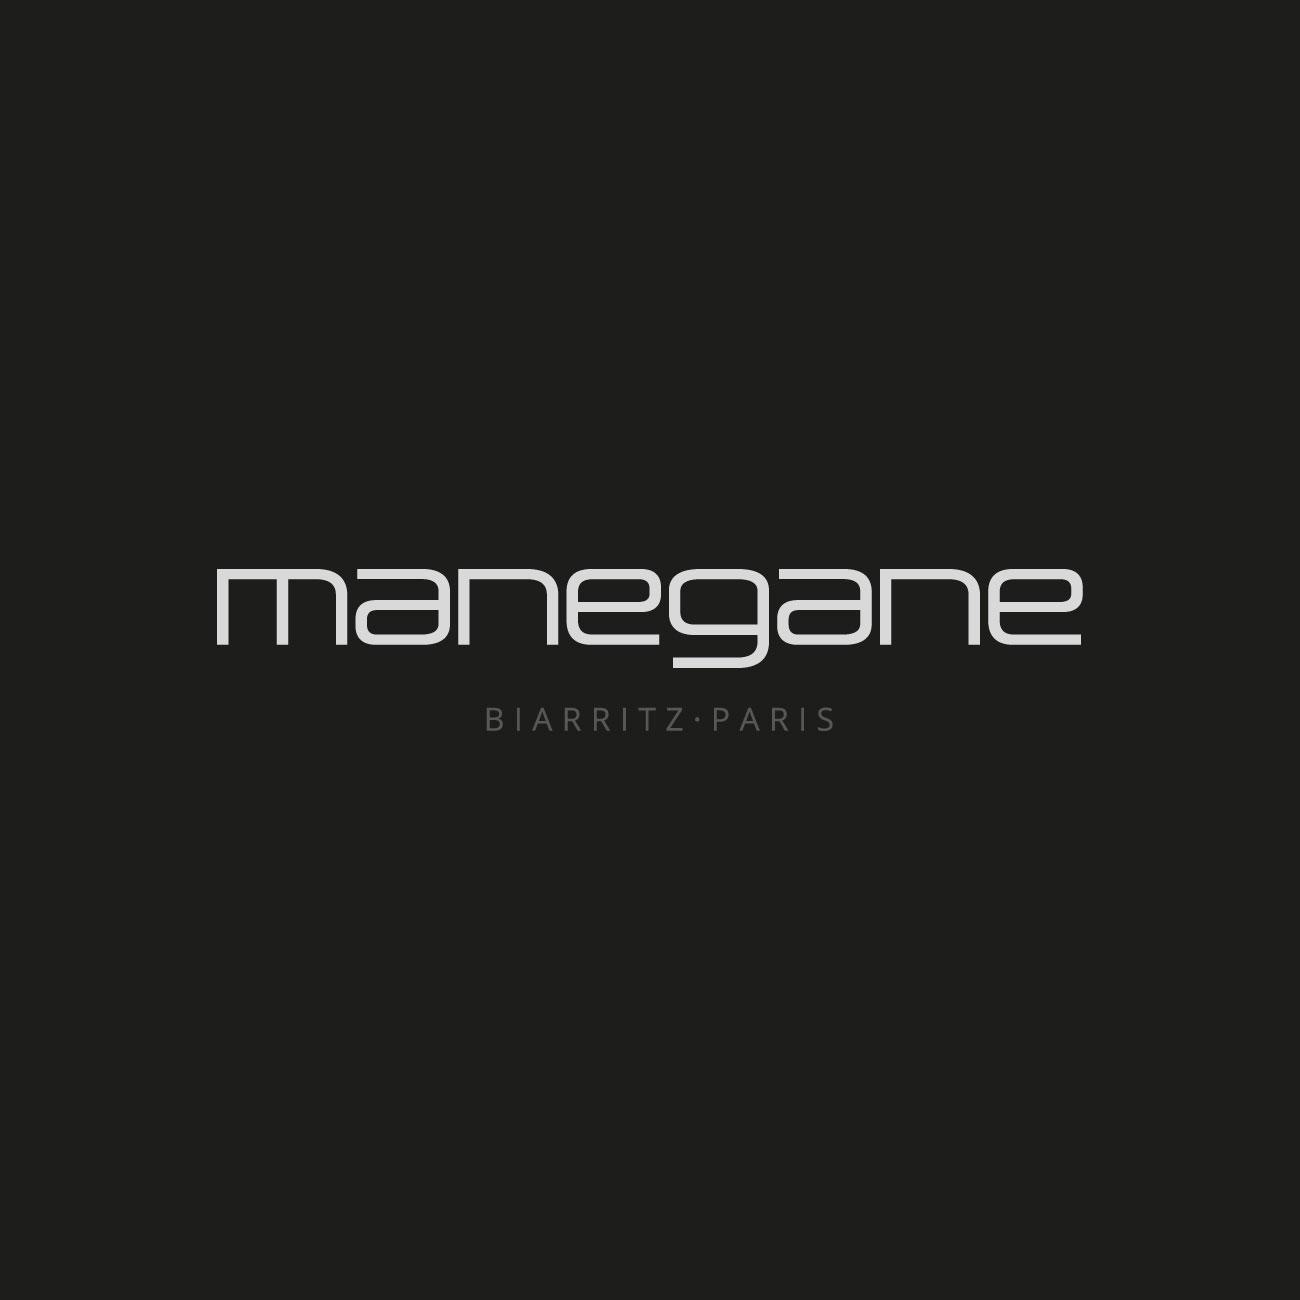 Aitana-Design-Manegane-2